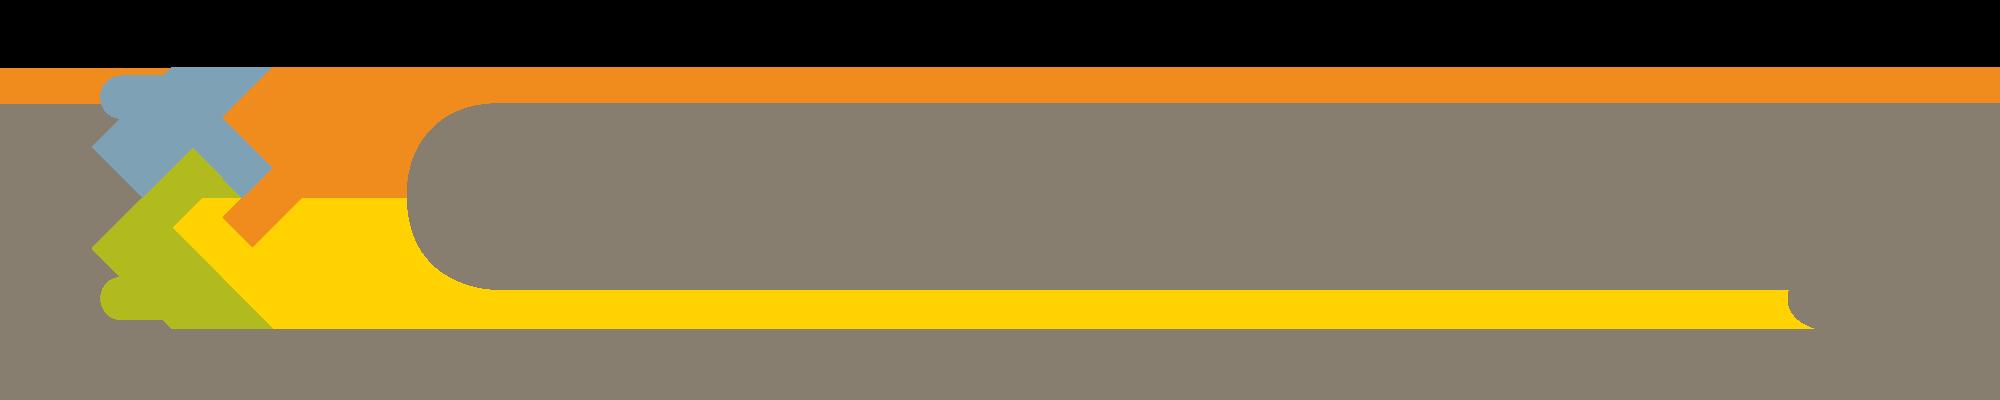 GG2015_Logo_horizontal_4color.png